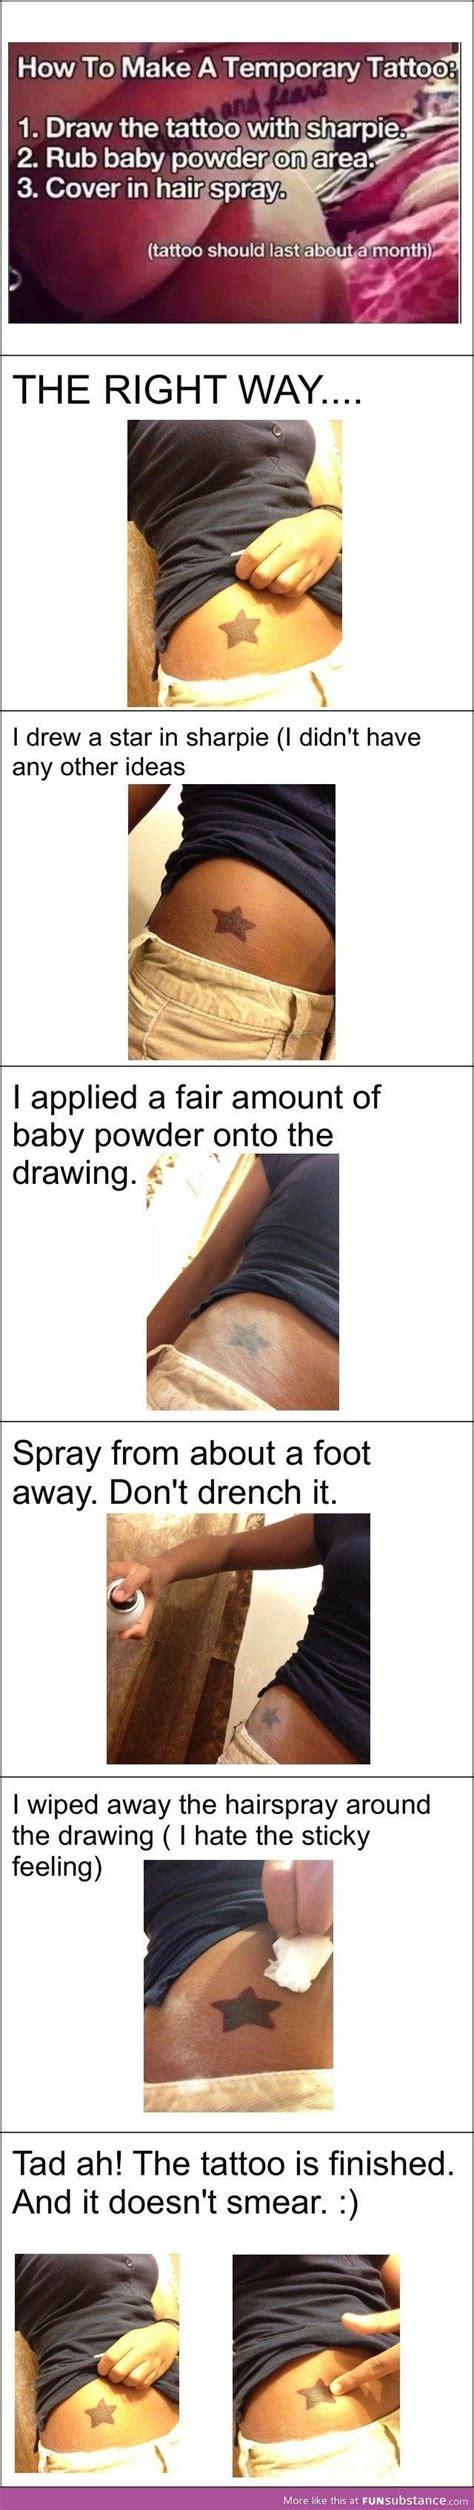 how to make sharpie tattoos last best 25 sharpie tattoos ideas on diy nails